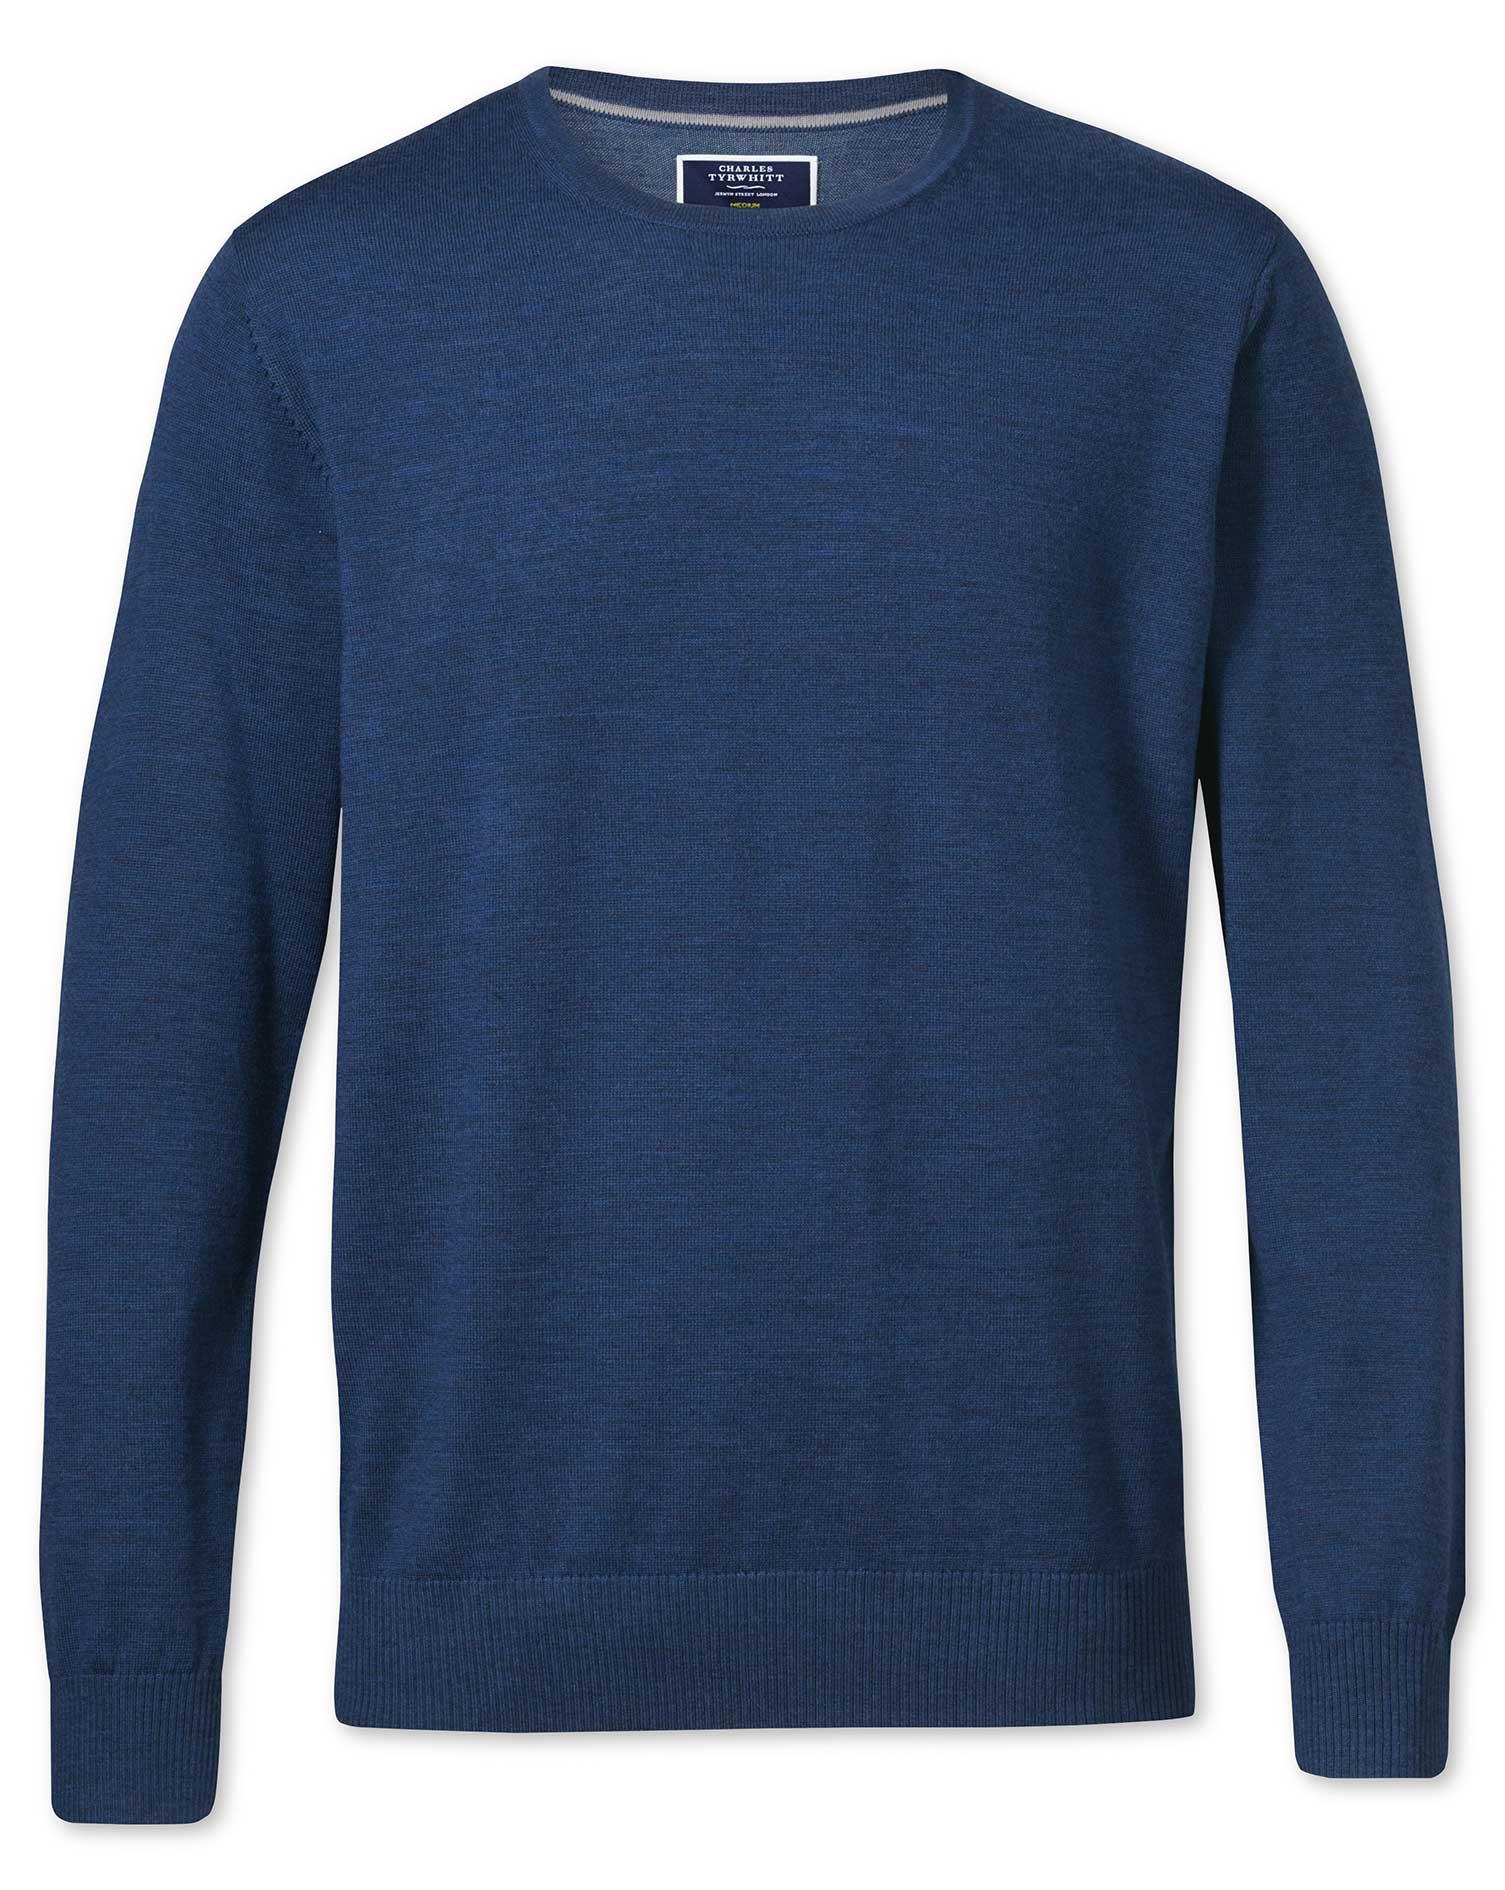 Mid Blue Merino Wool Crew Neck Jumper Size Small by Charles Tyrwhitt